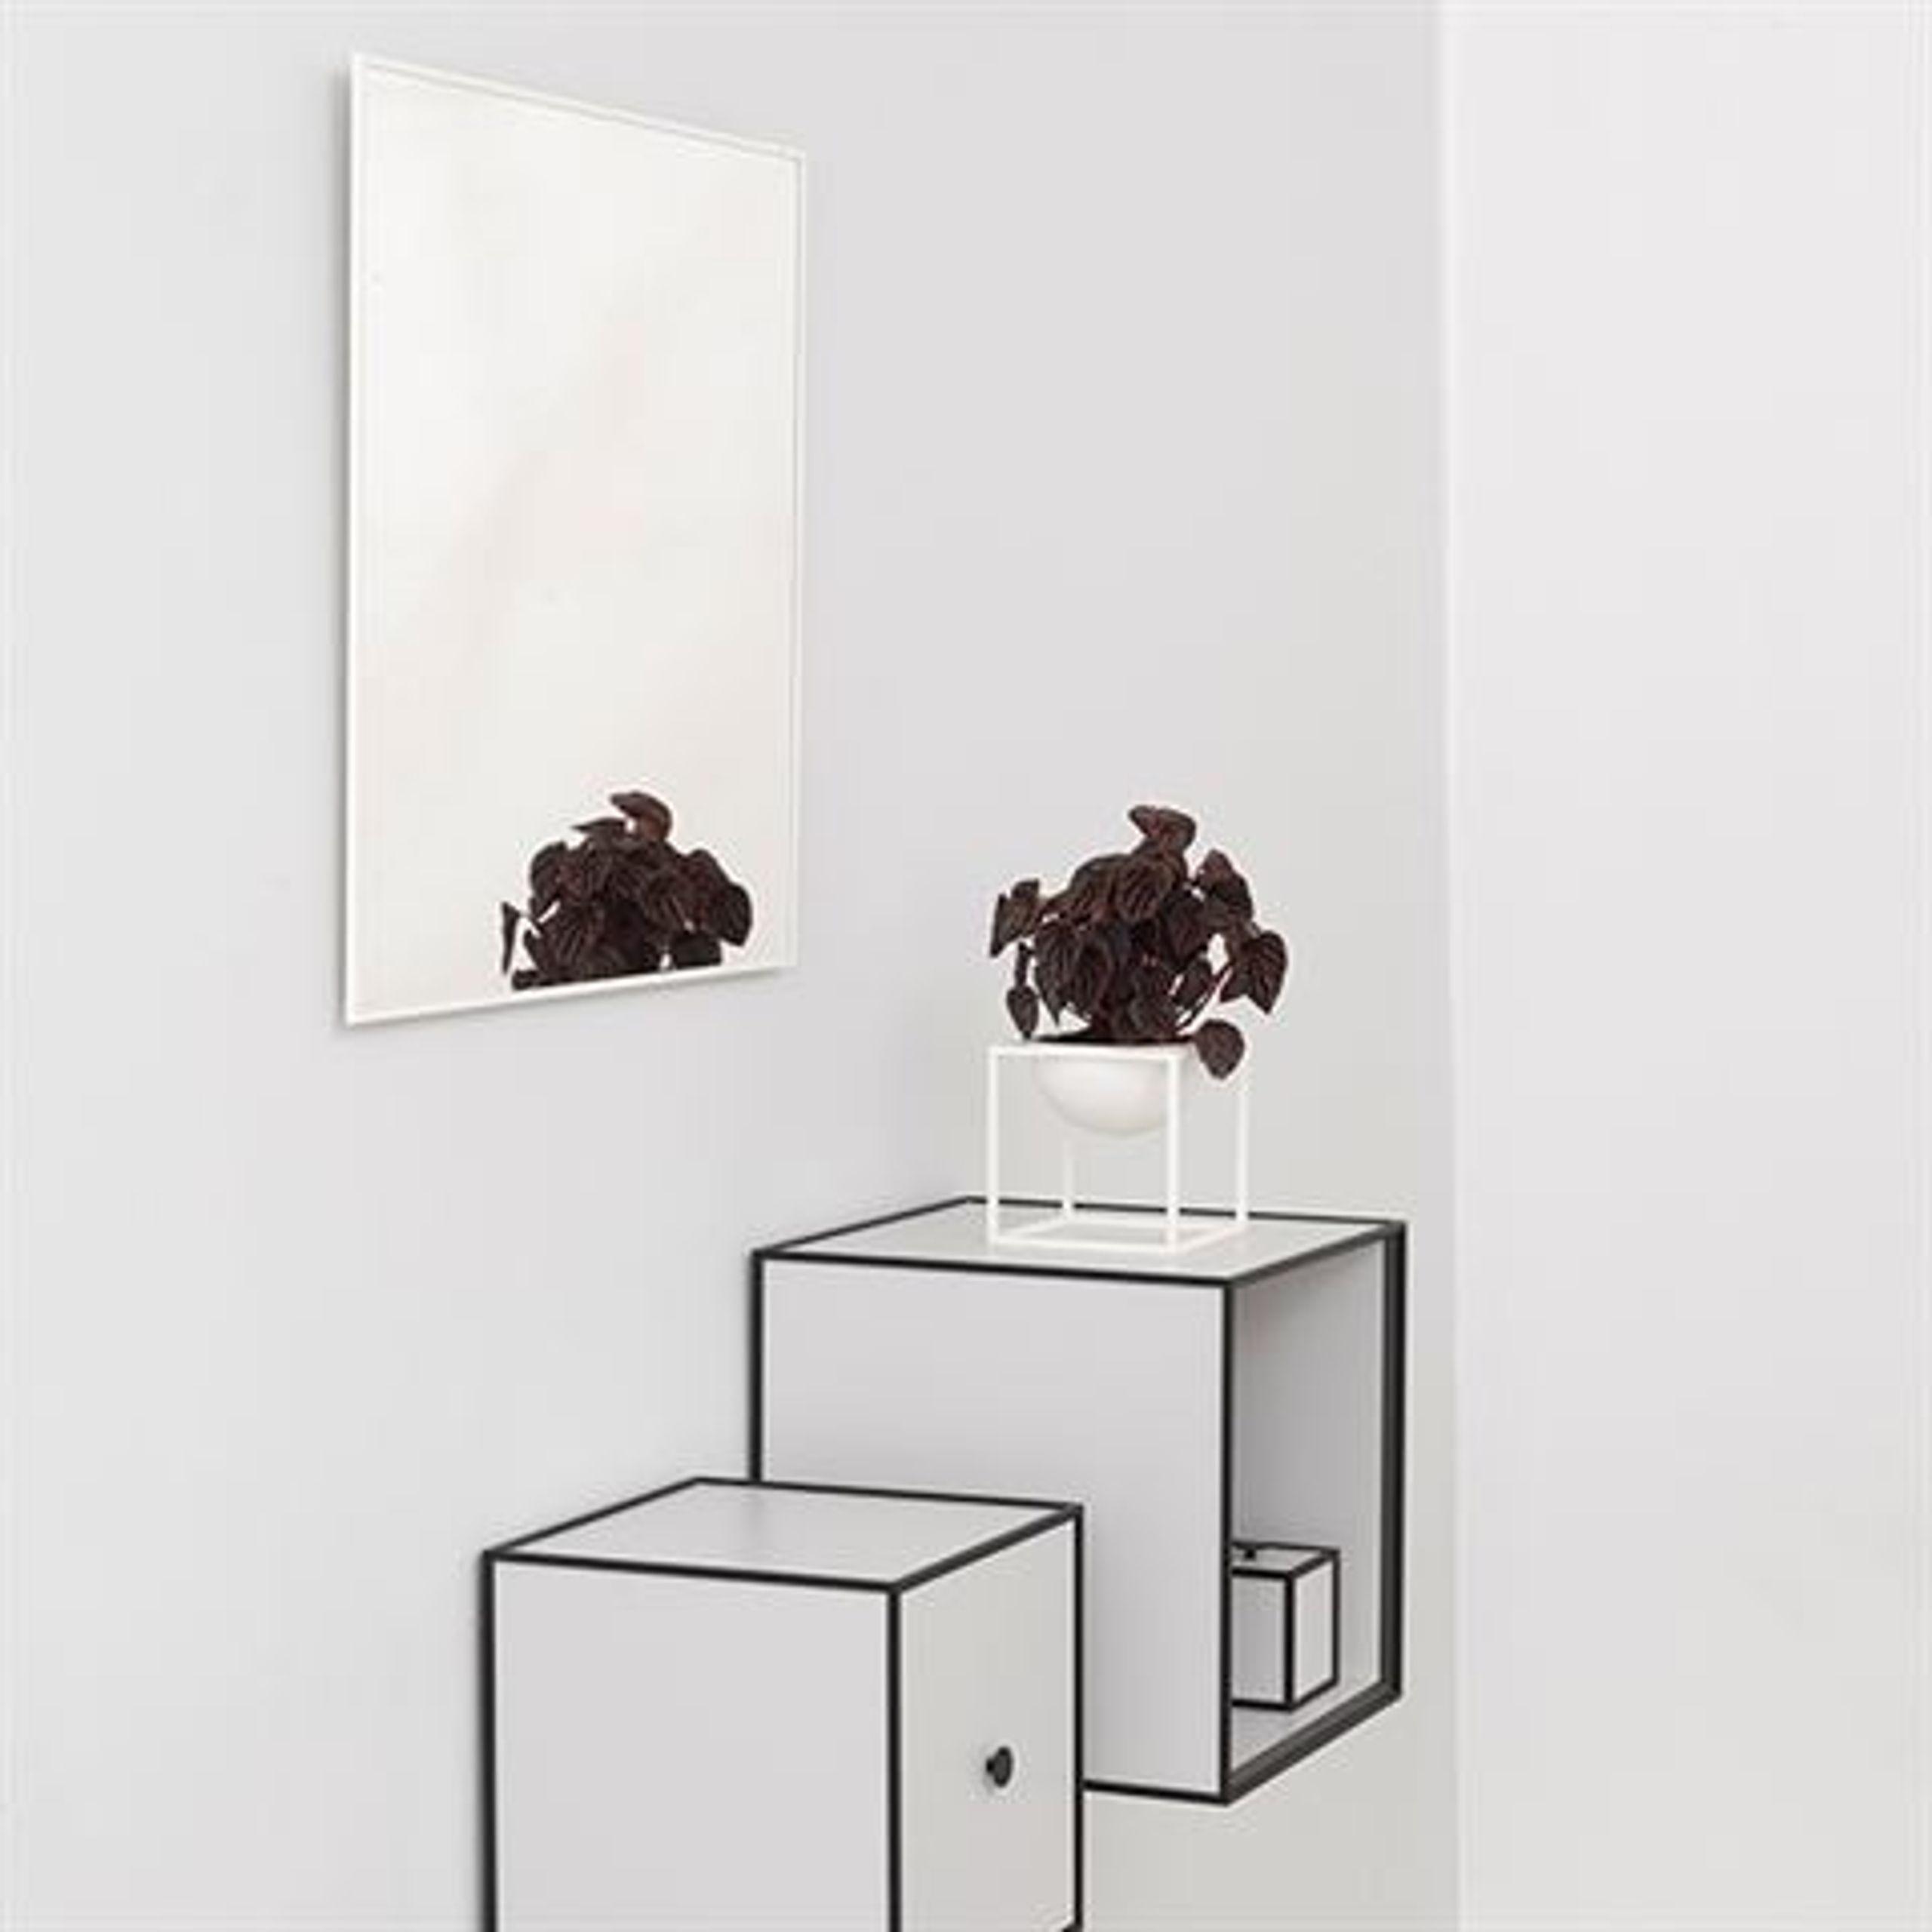 kubus bowl sk l by lassen. Black Bedroom Furniture Sets. Home Design Ideas